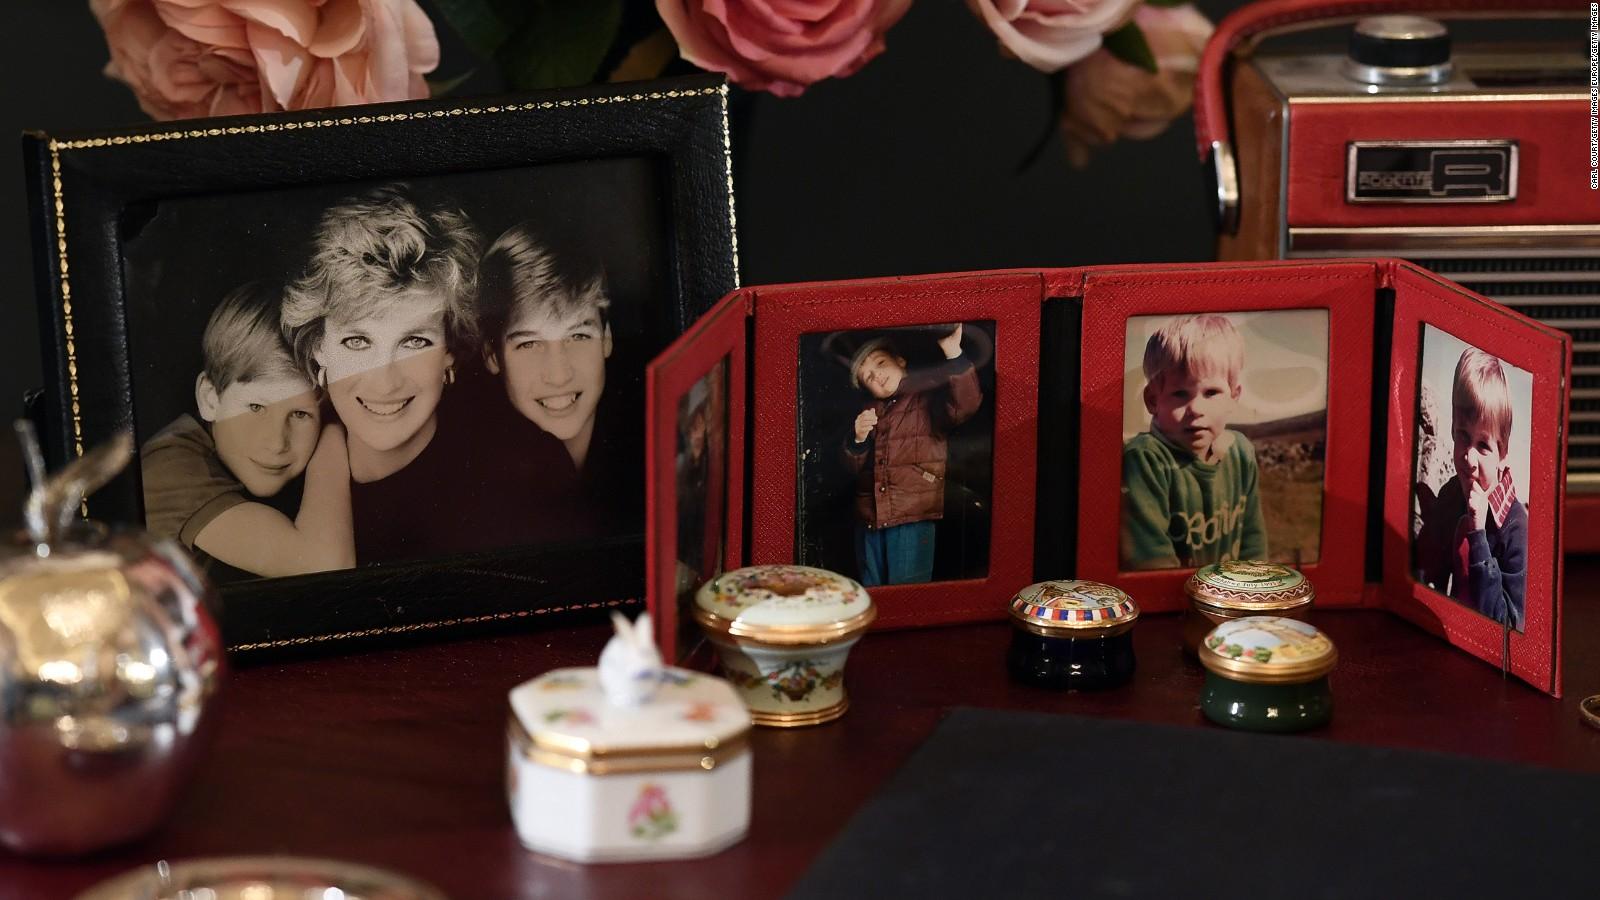 Princess Dianas Belongings Are Going on Display at Buckingham Palace